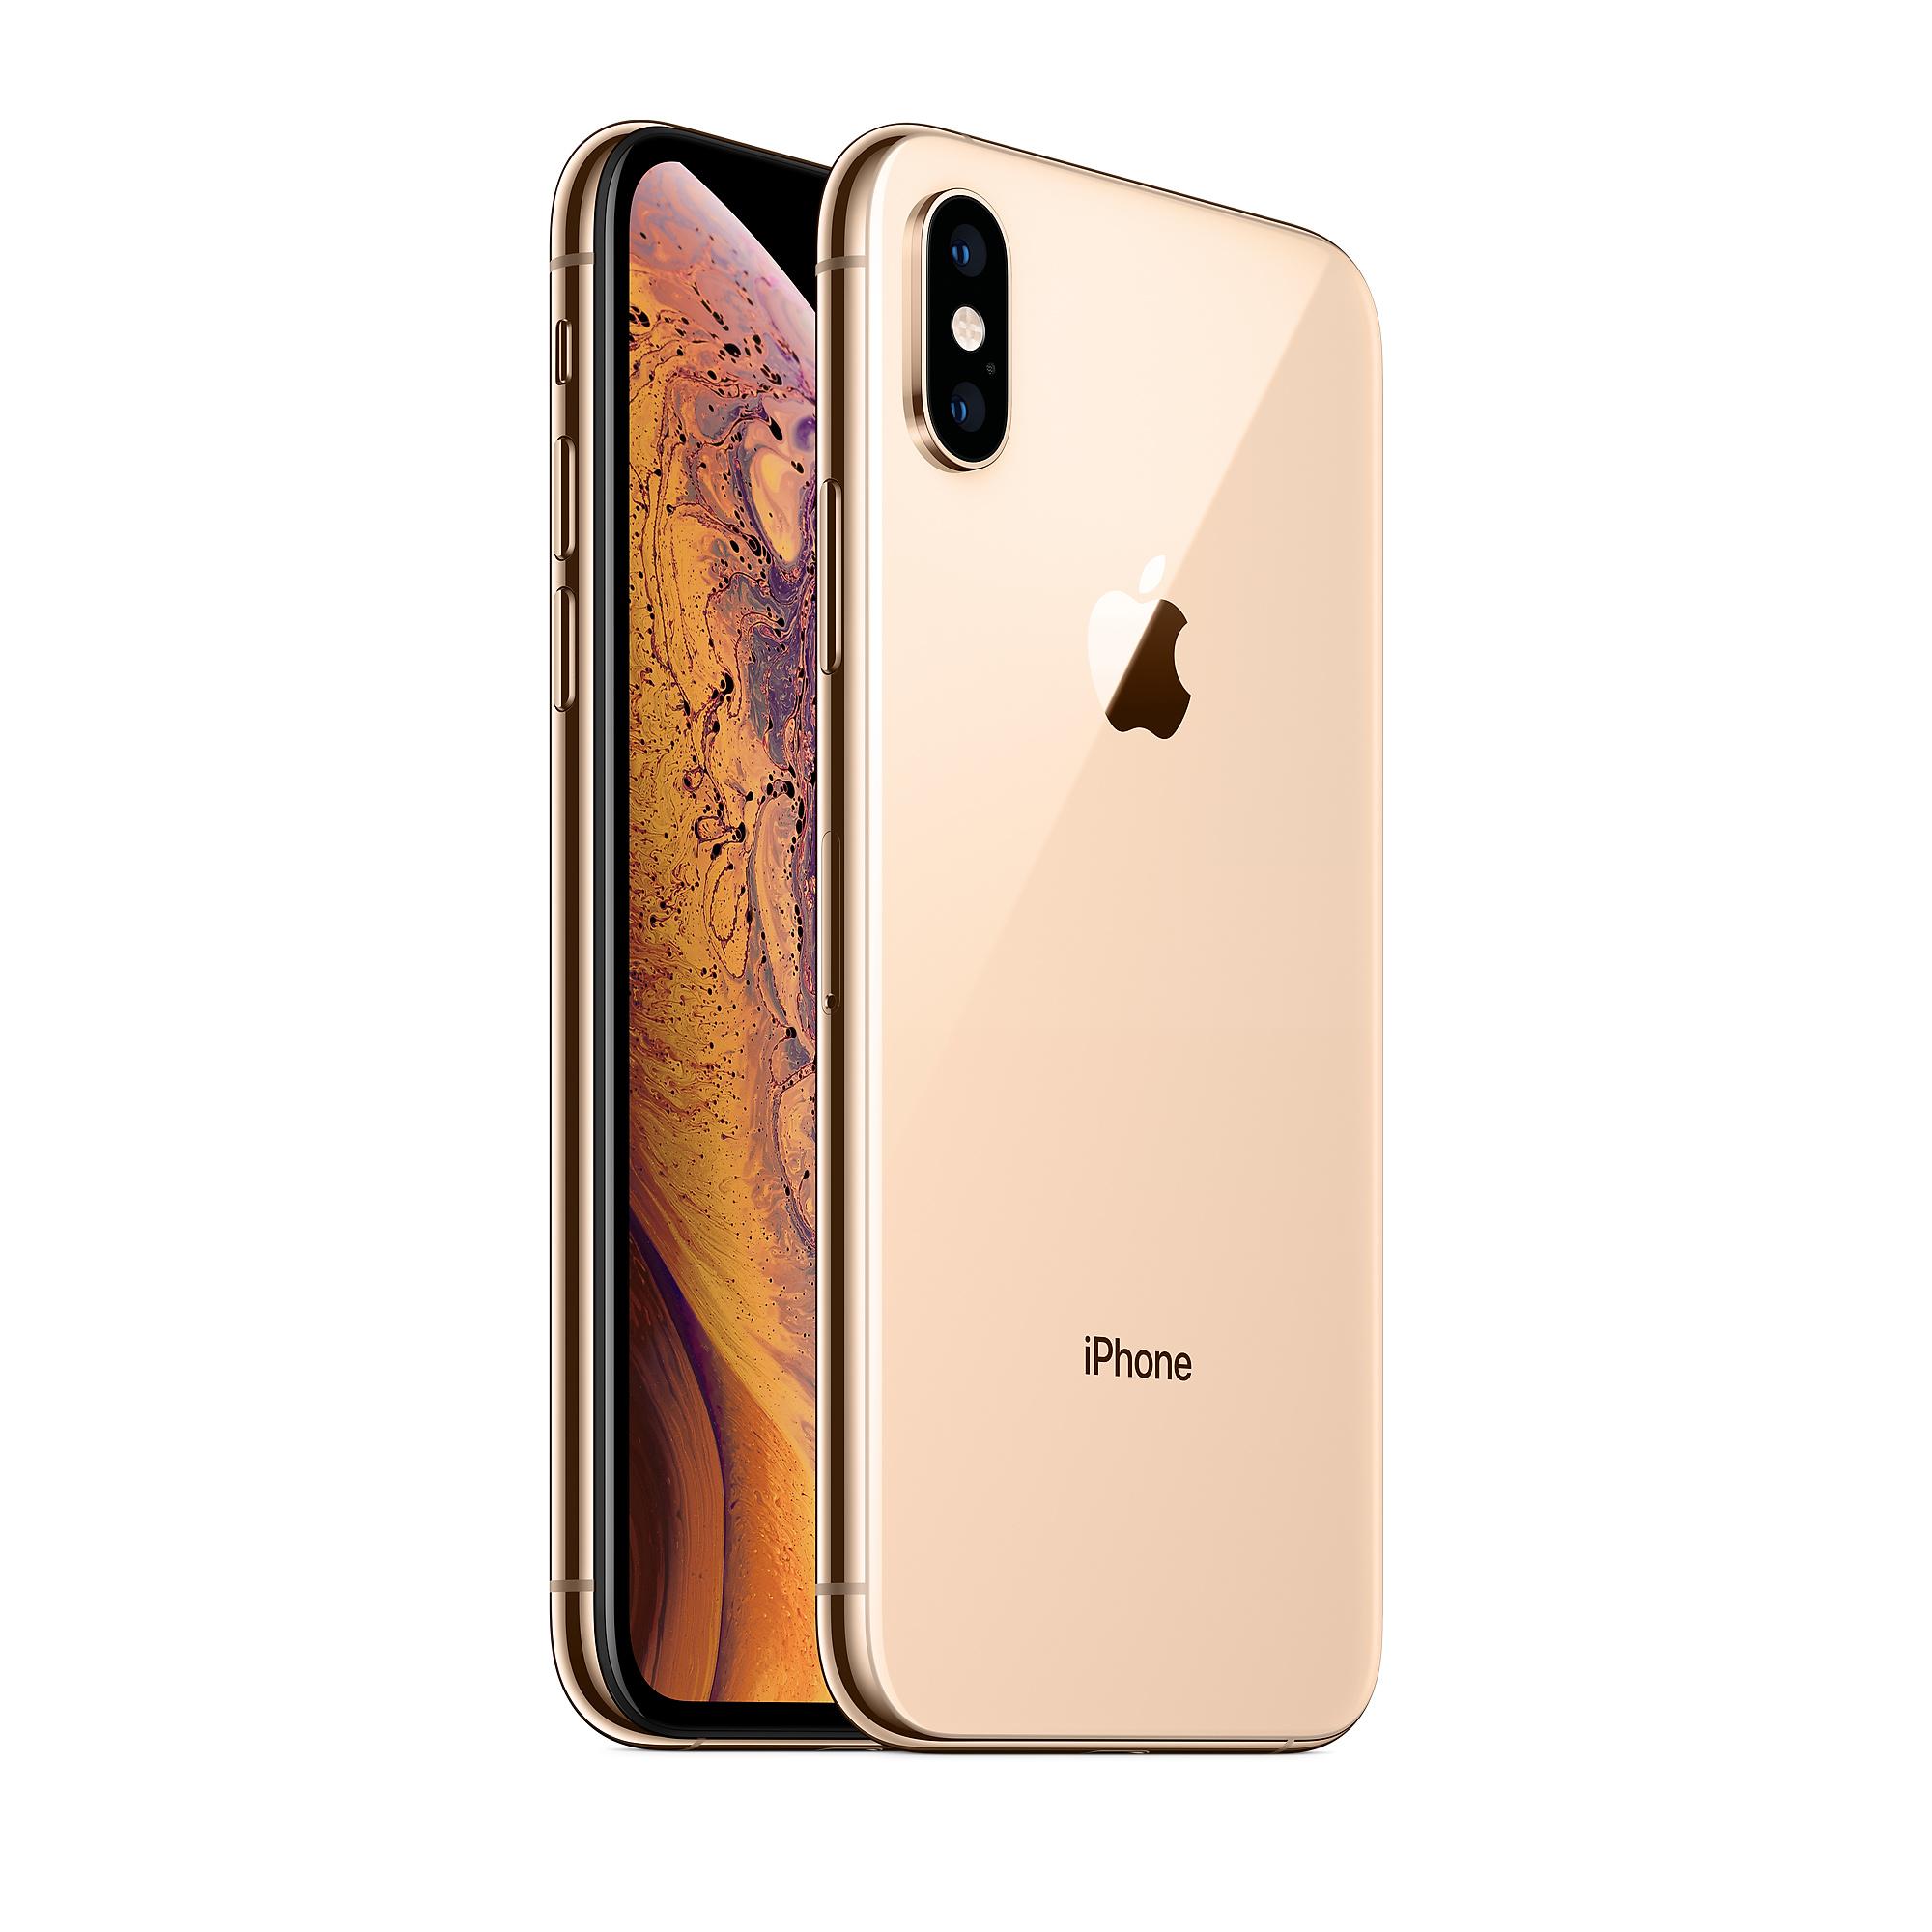 iPhone XS 256GB Gold $624